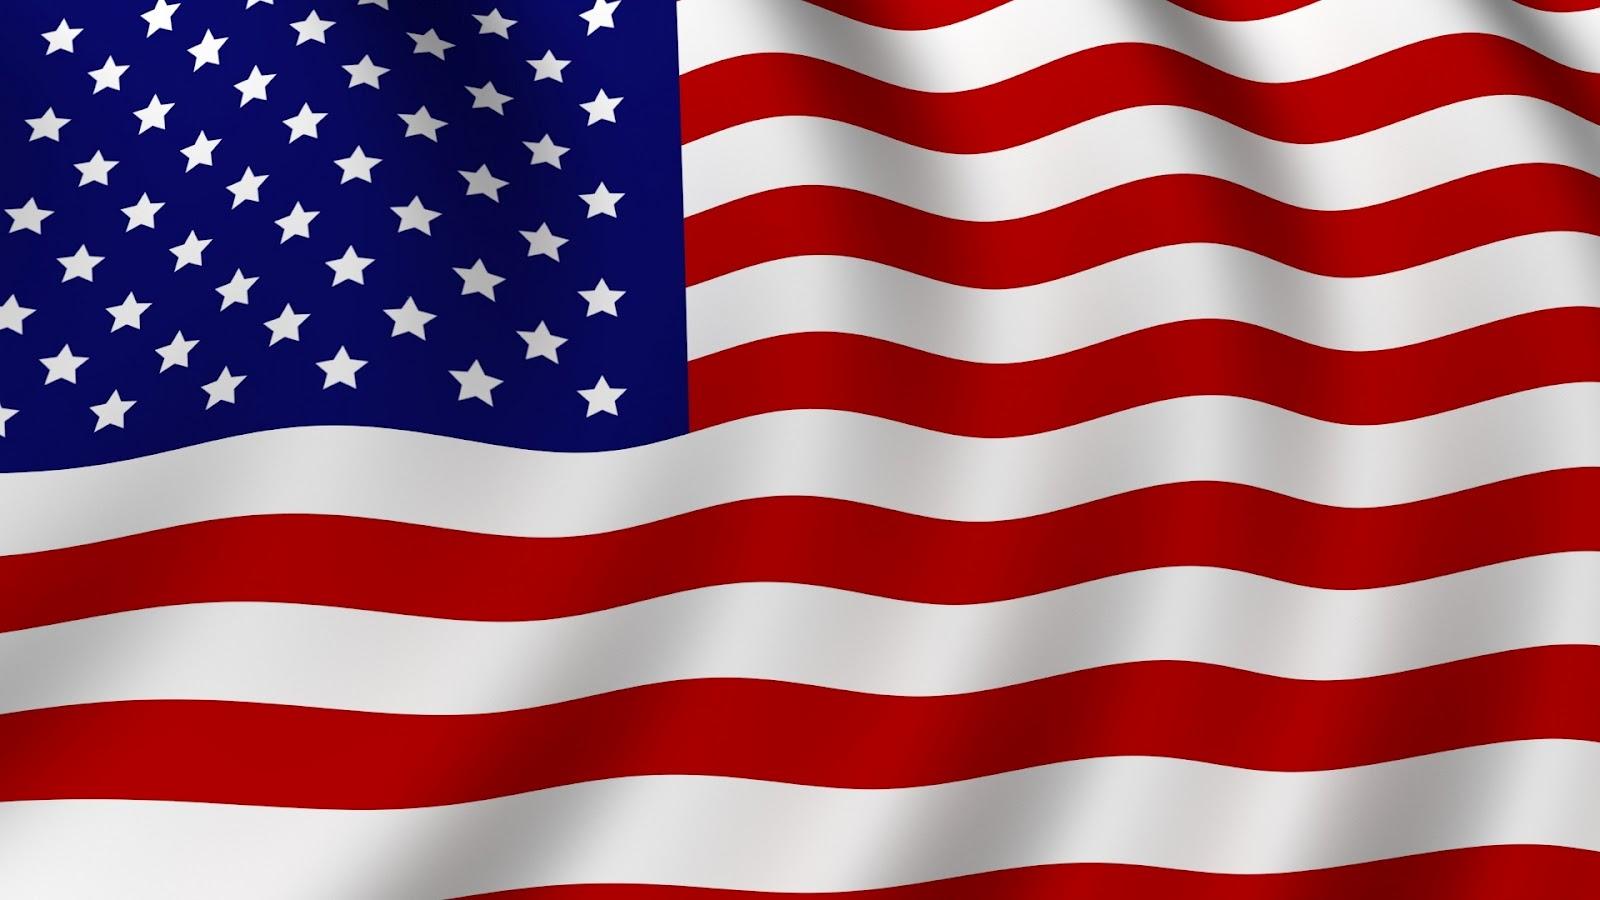 american flag global wallpapers